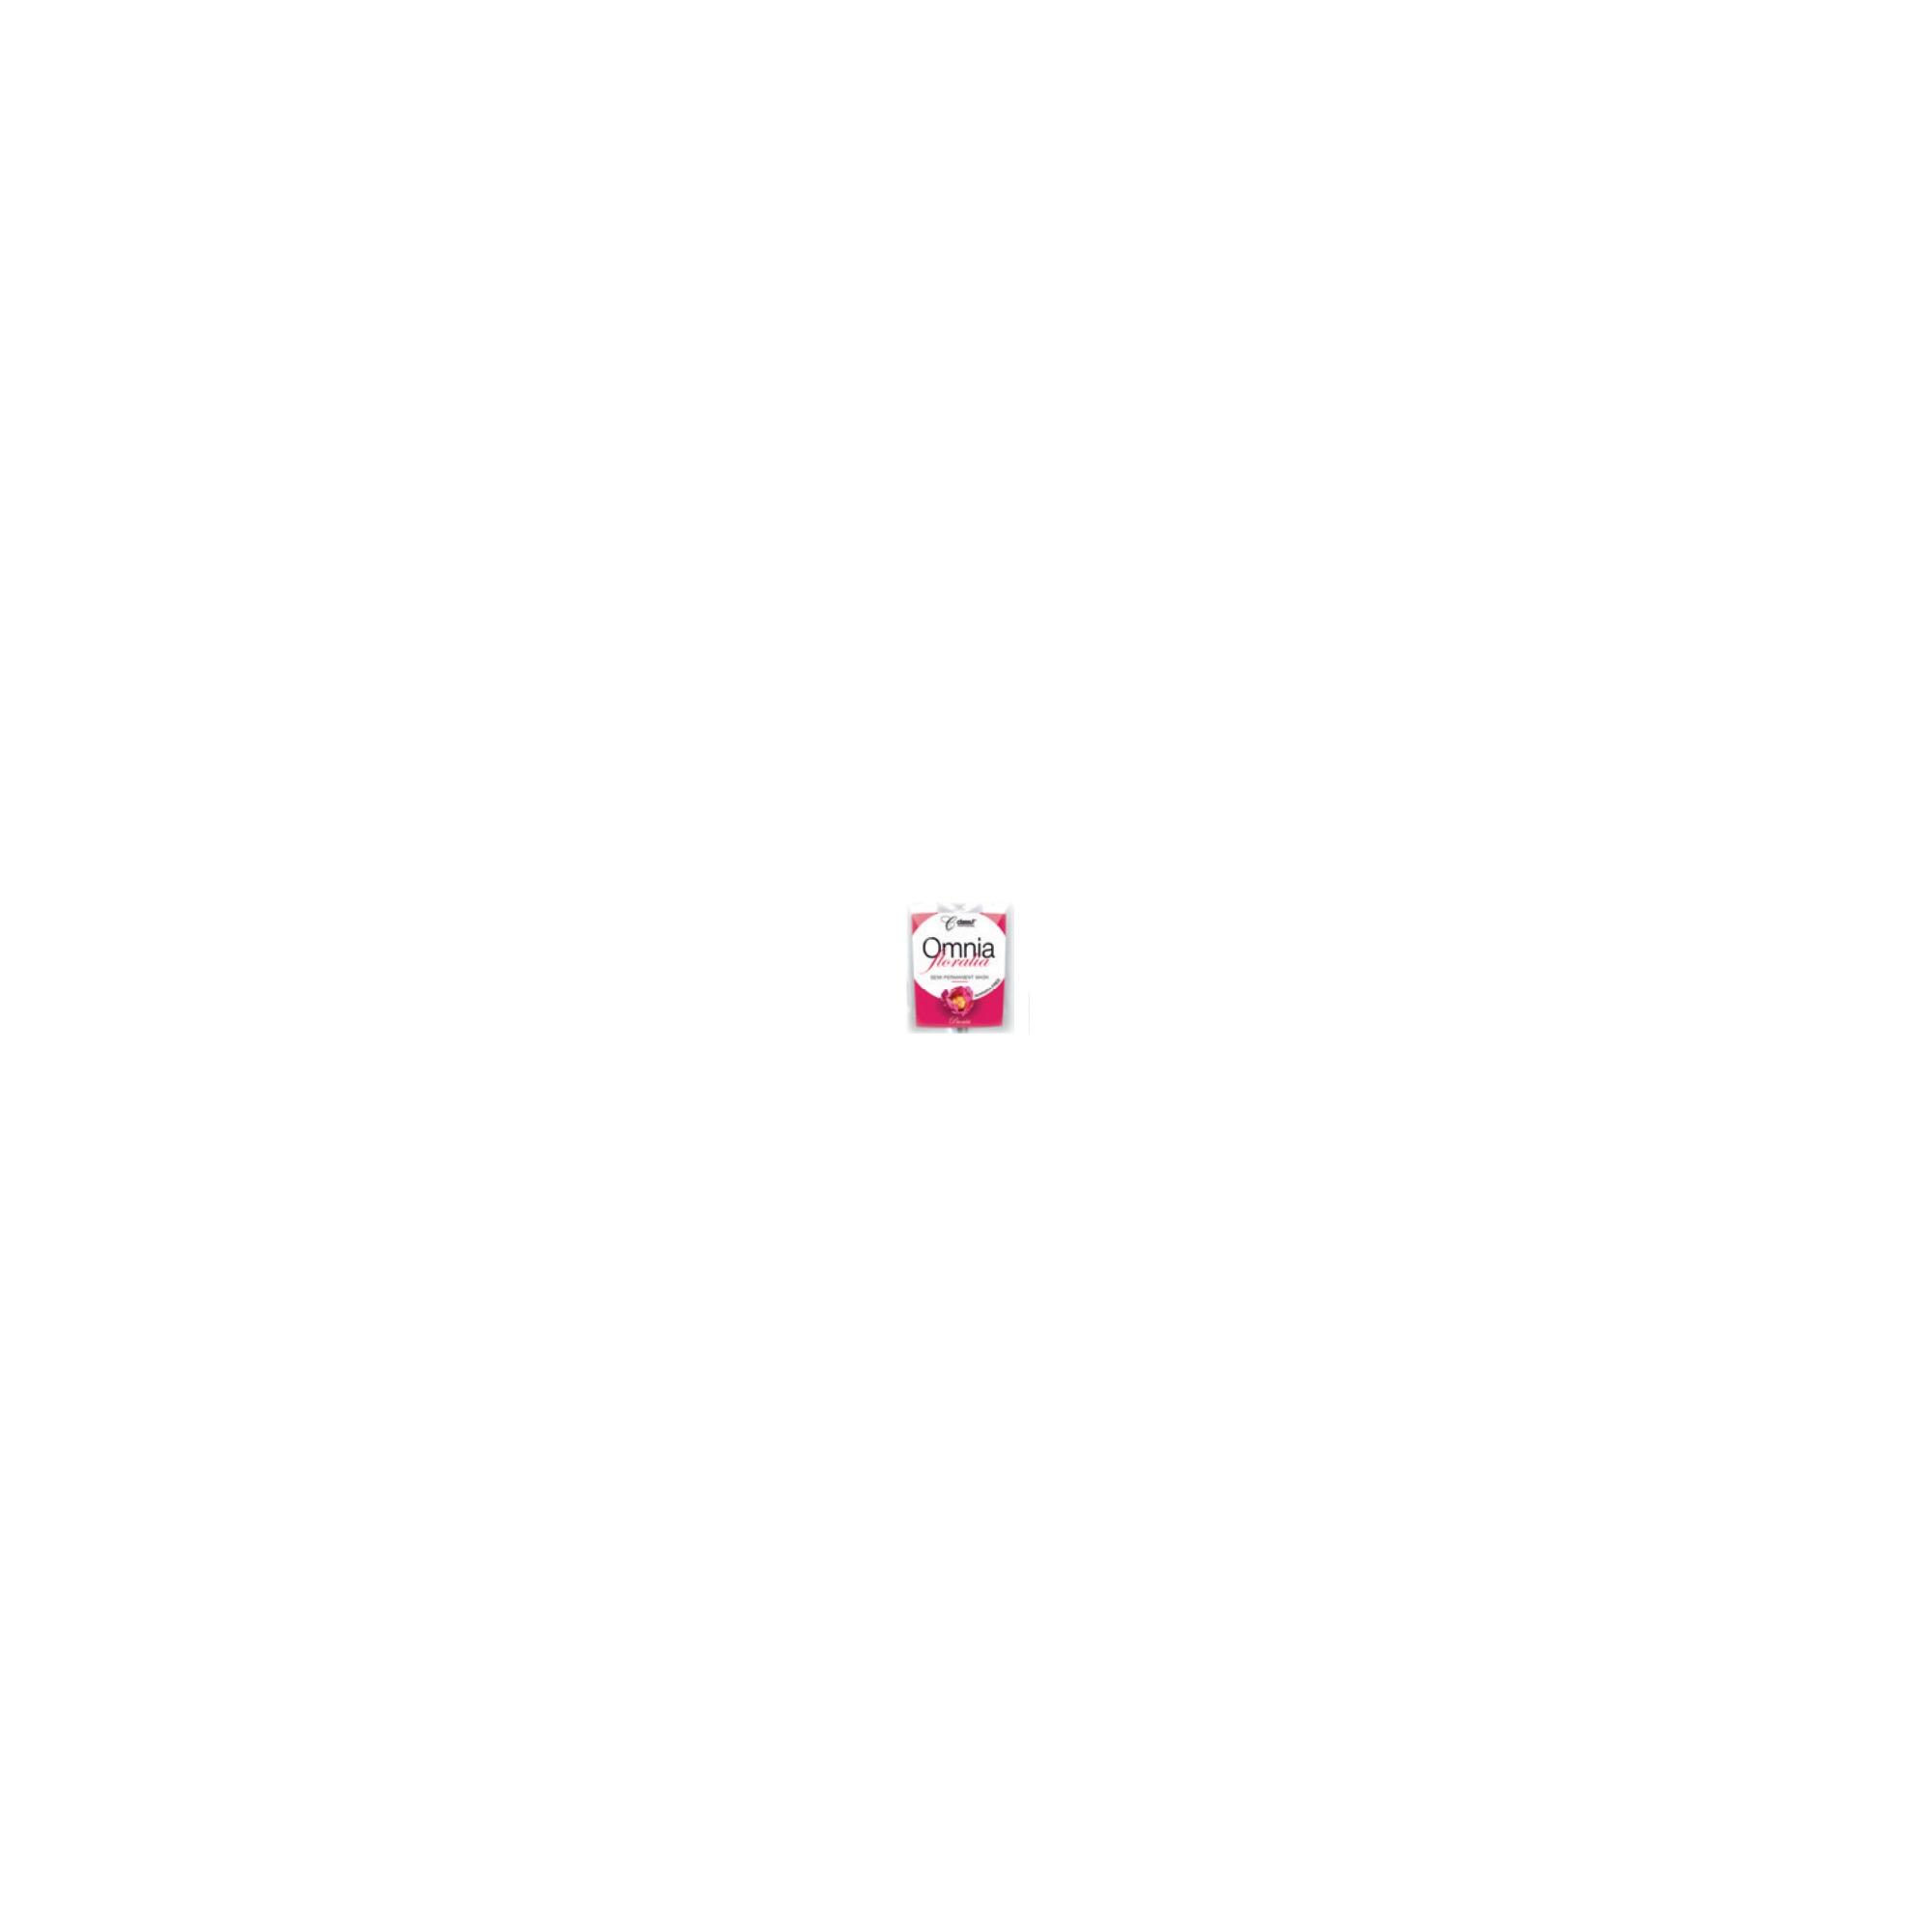 Omnia floralia - Maschera semipermanente Peonia